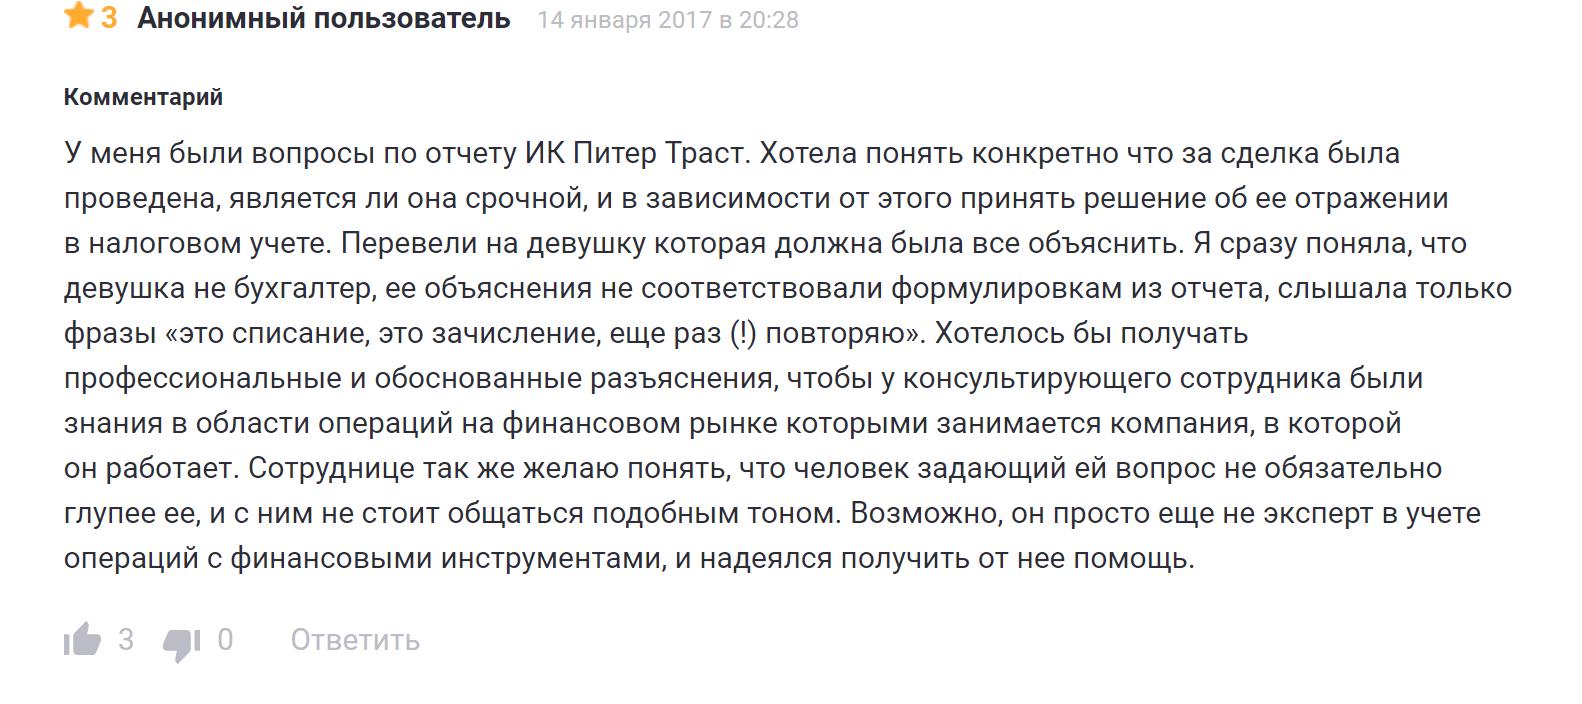 Отзывы о «Питер Траст»